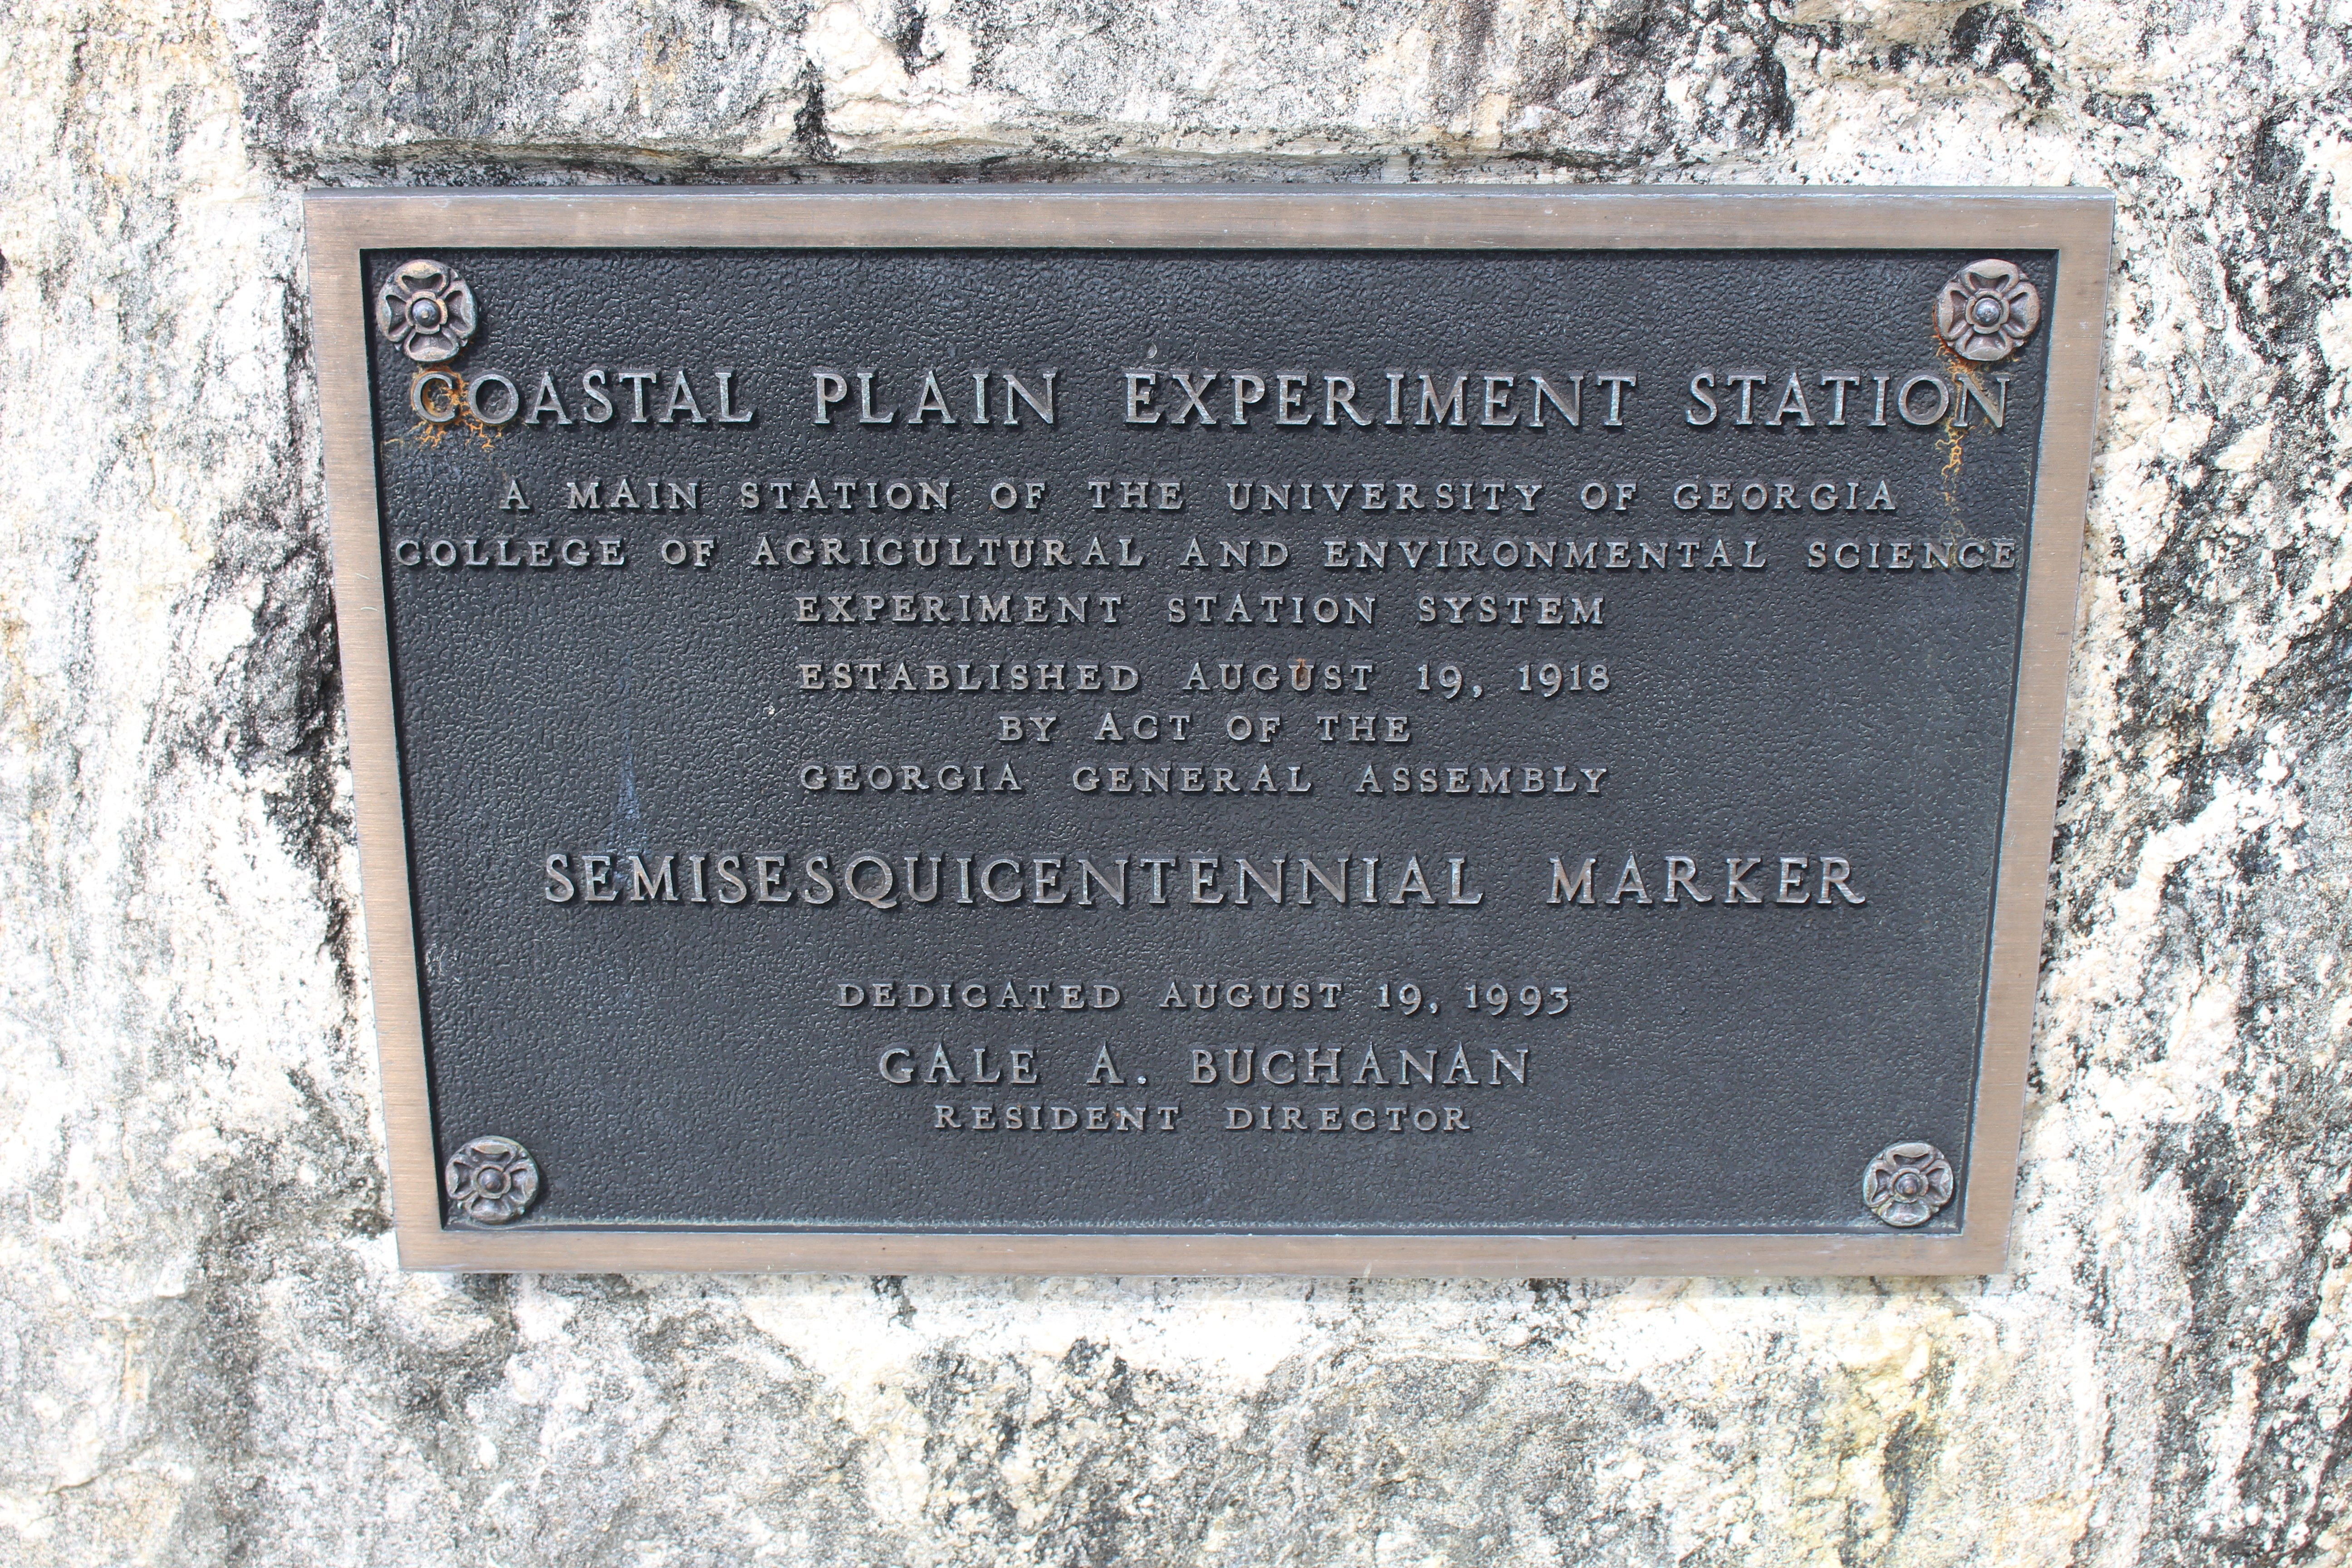 File:University of Georgia, Coastal Plain Experiment Station